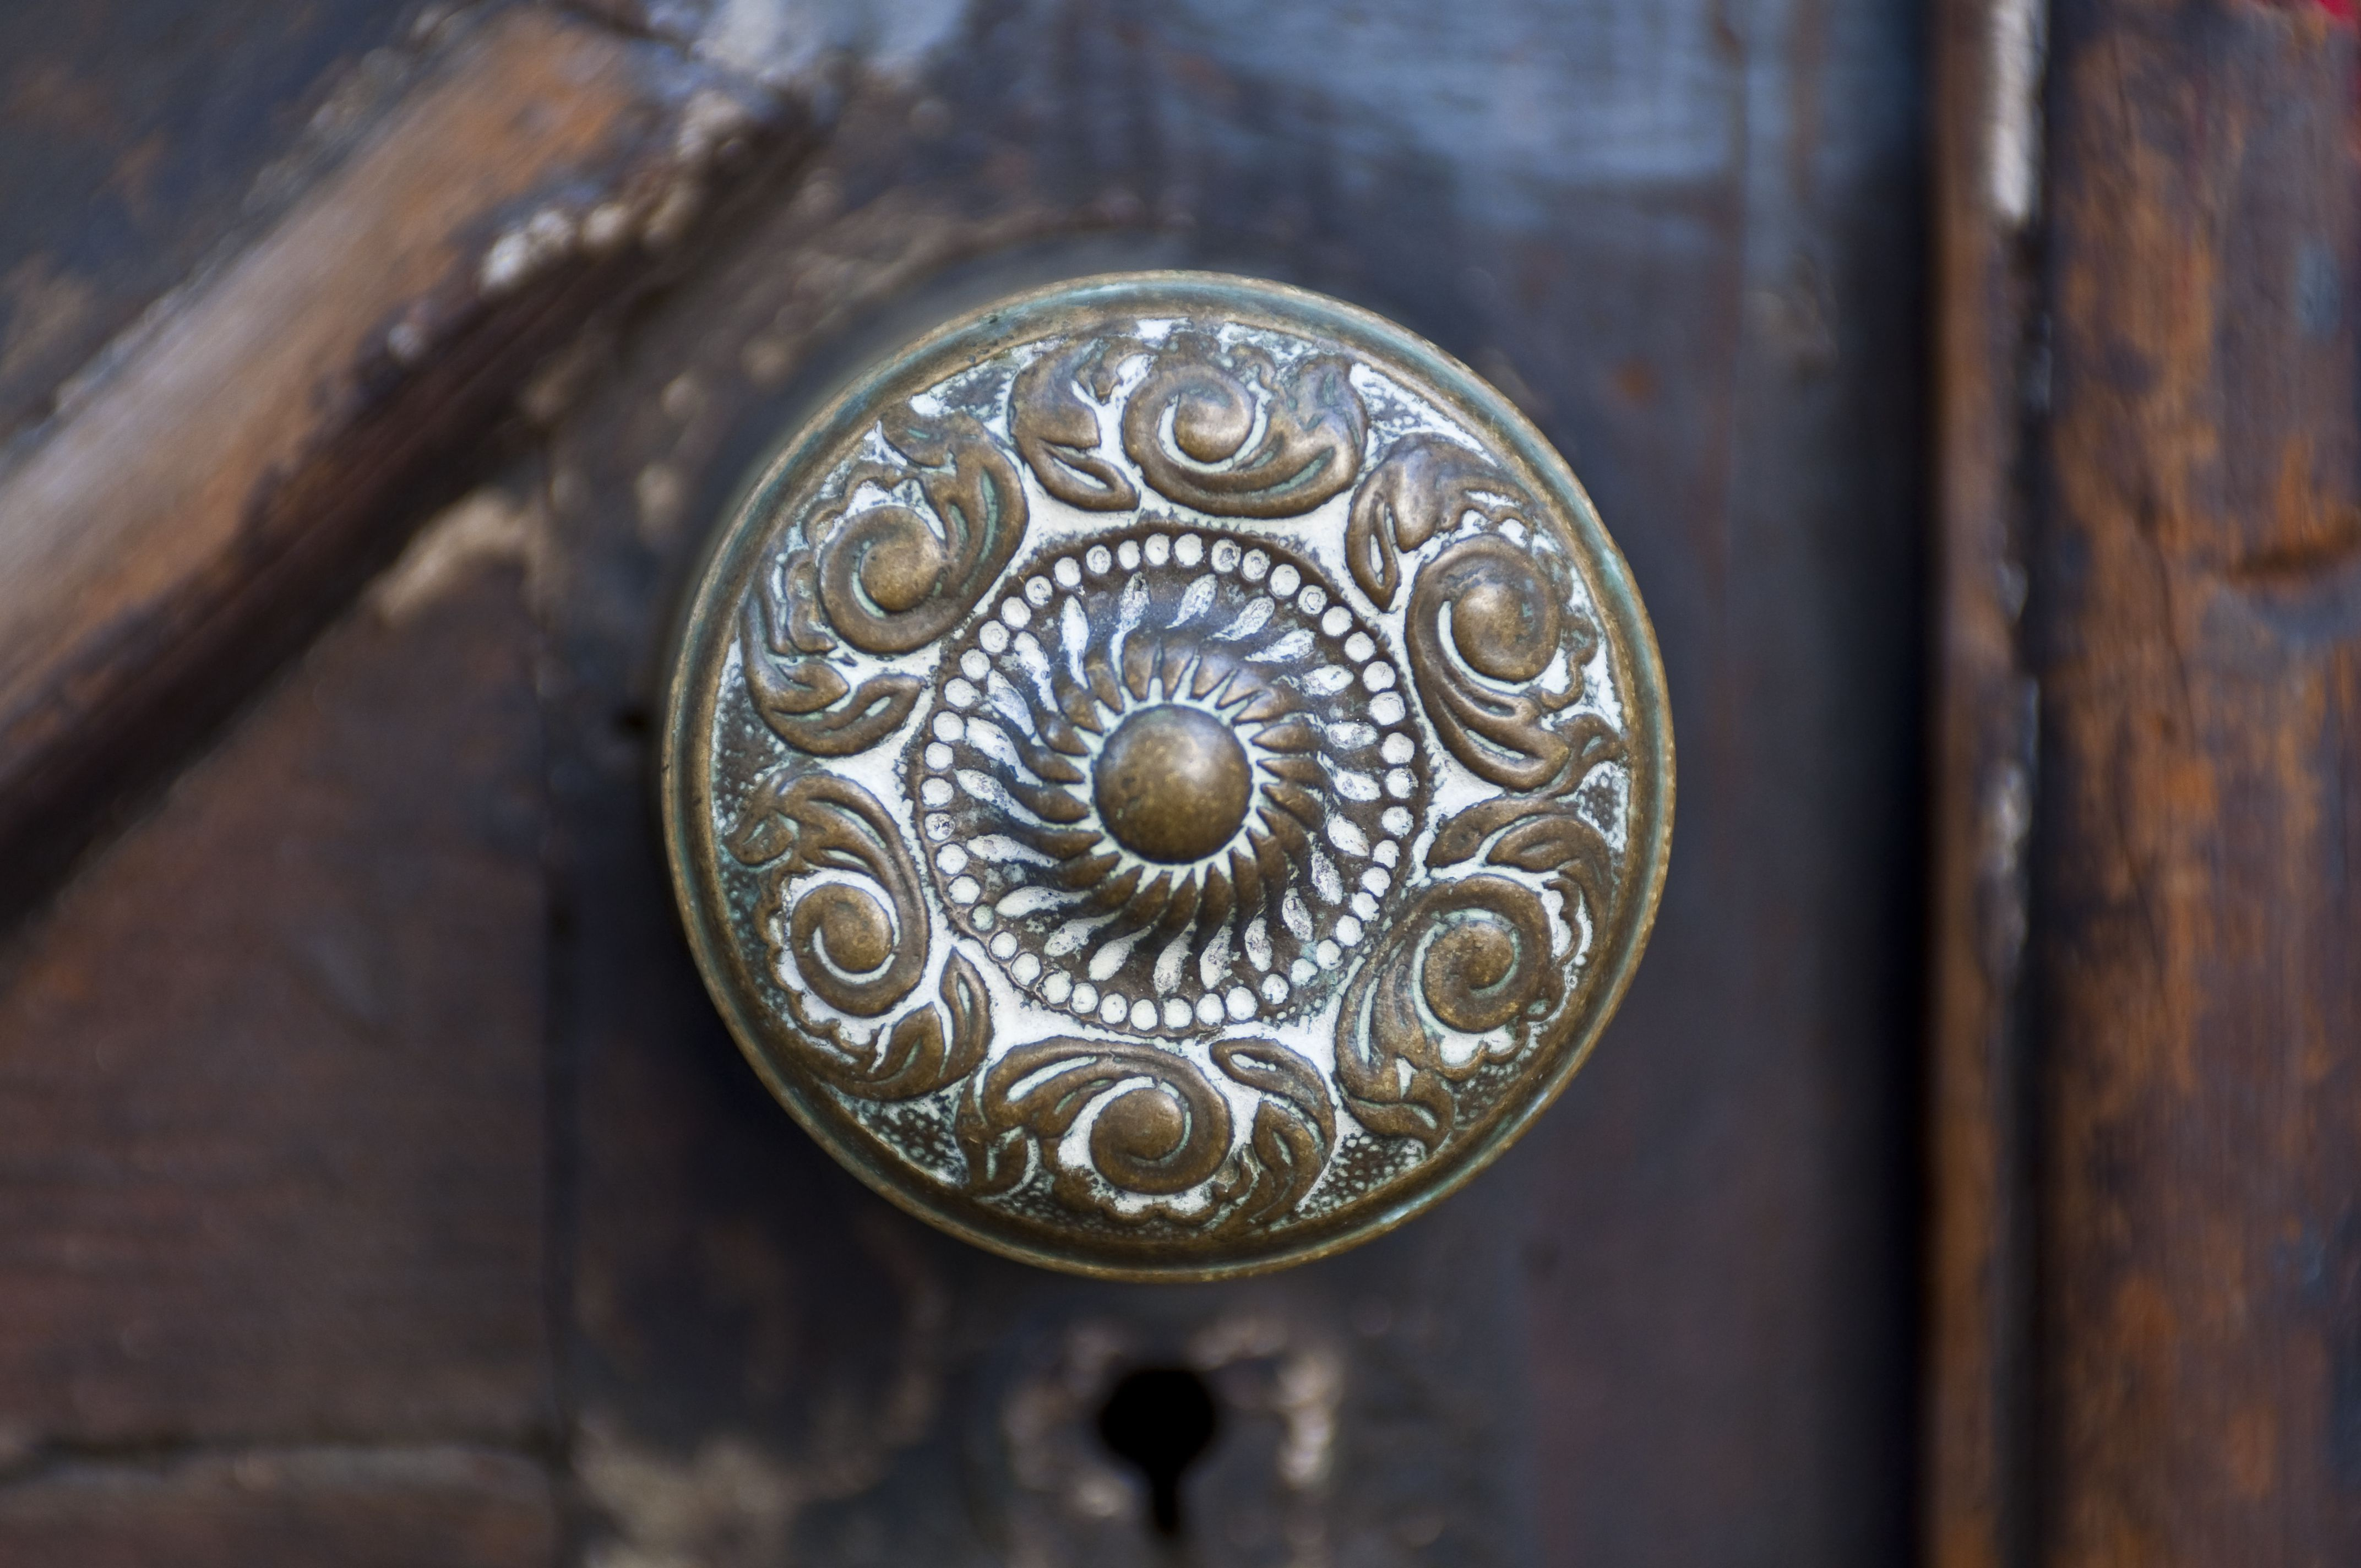 close-up view of antique brass door knob